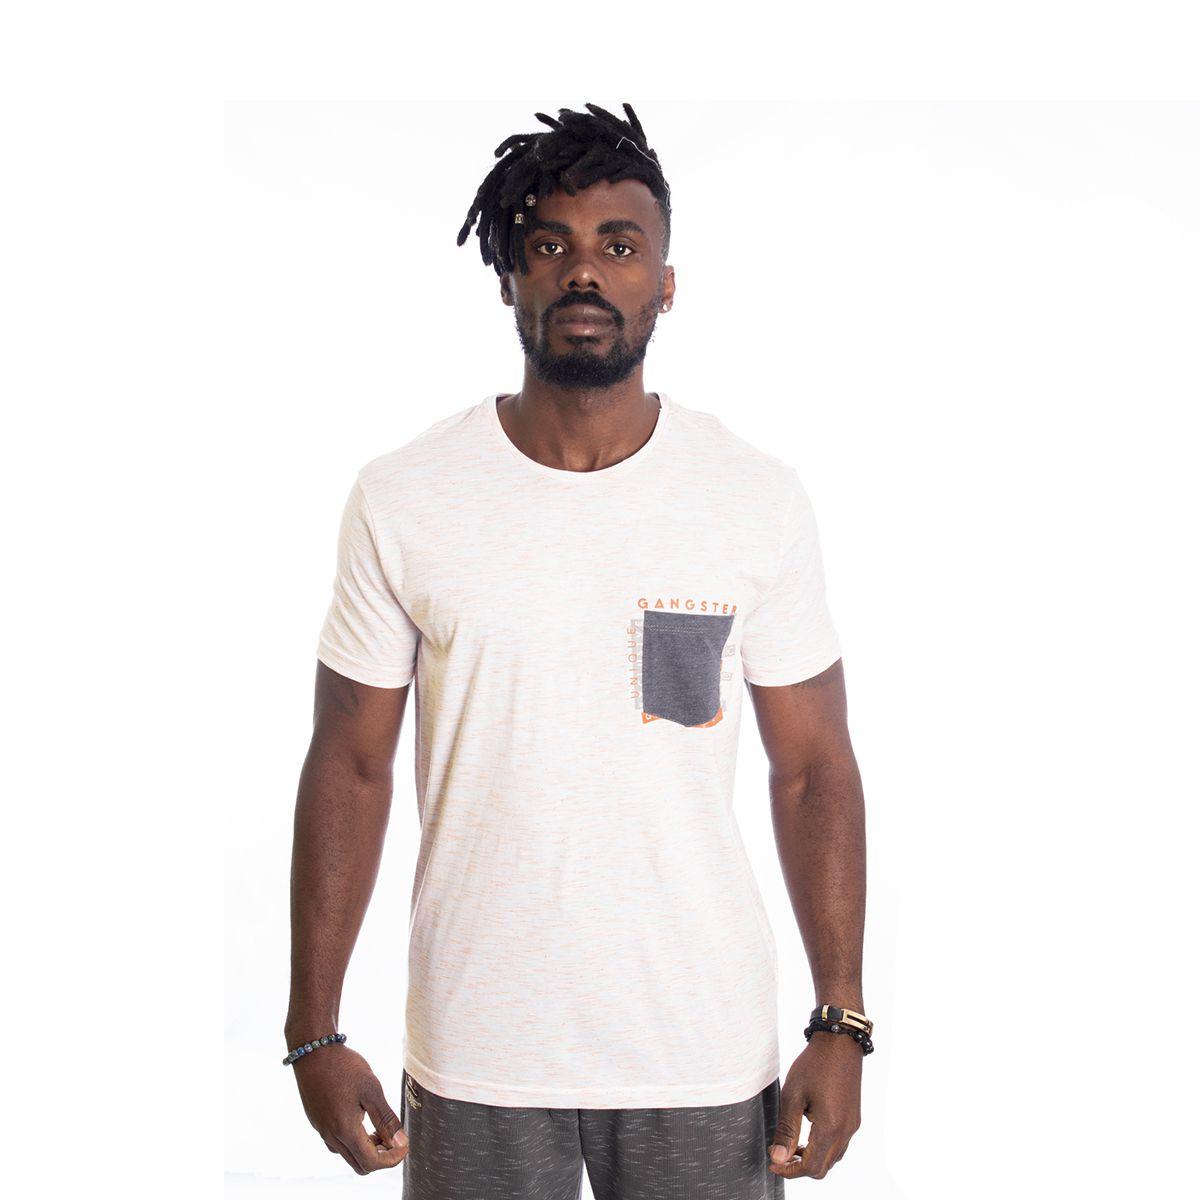 Camiseta Masculina Gangster Clássica 11.24.1010